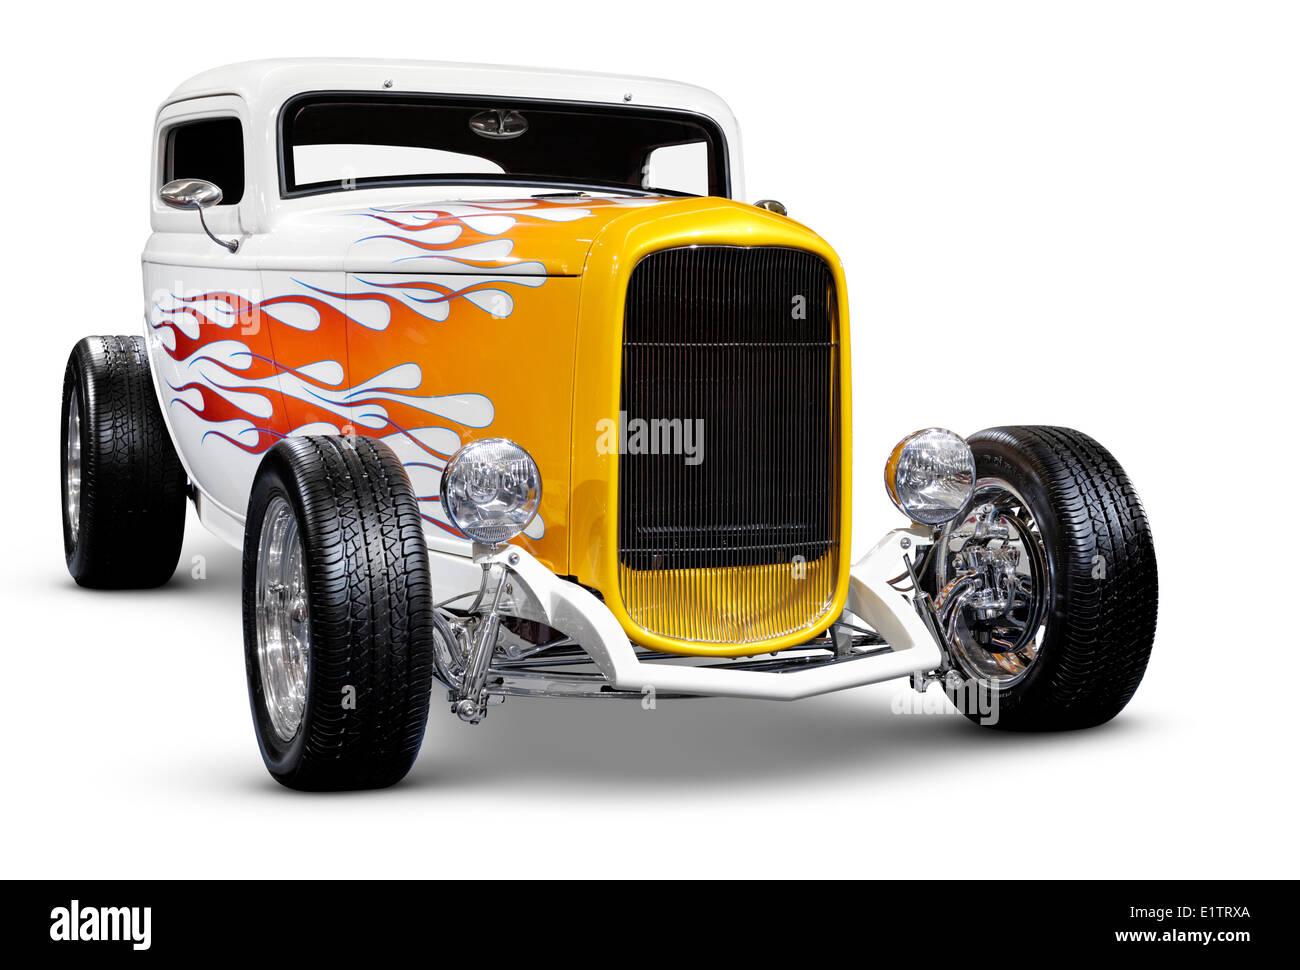 hot rod ford 3 ventana hi boy coupe 1932 retro coche con patr n llama pintado sobre aislado. Black Bedroom Furniture Sets. Home Design Ideas